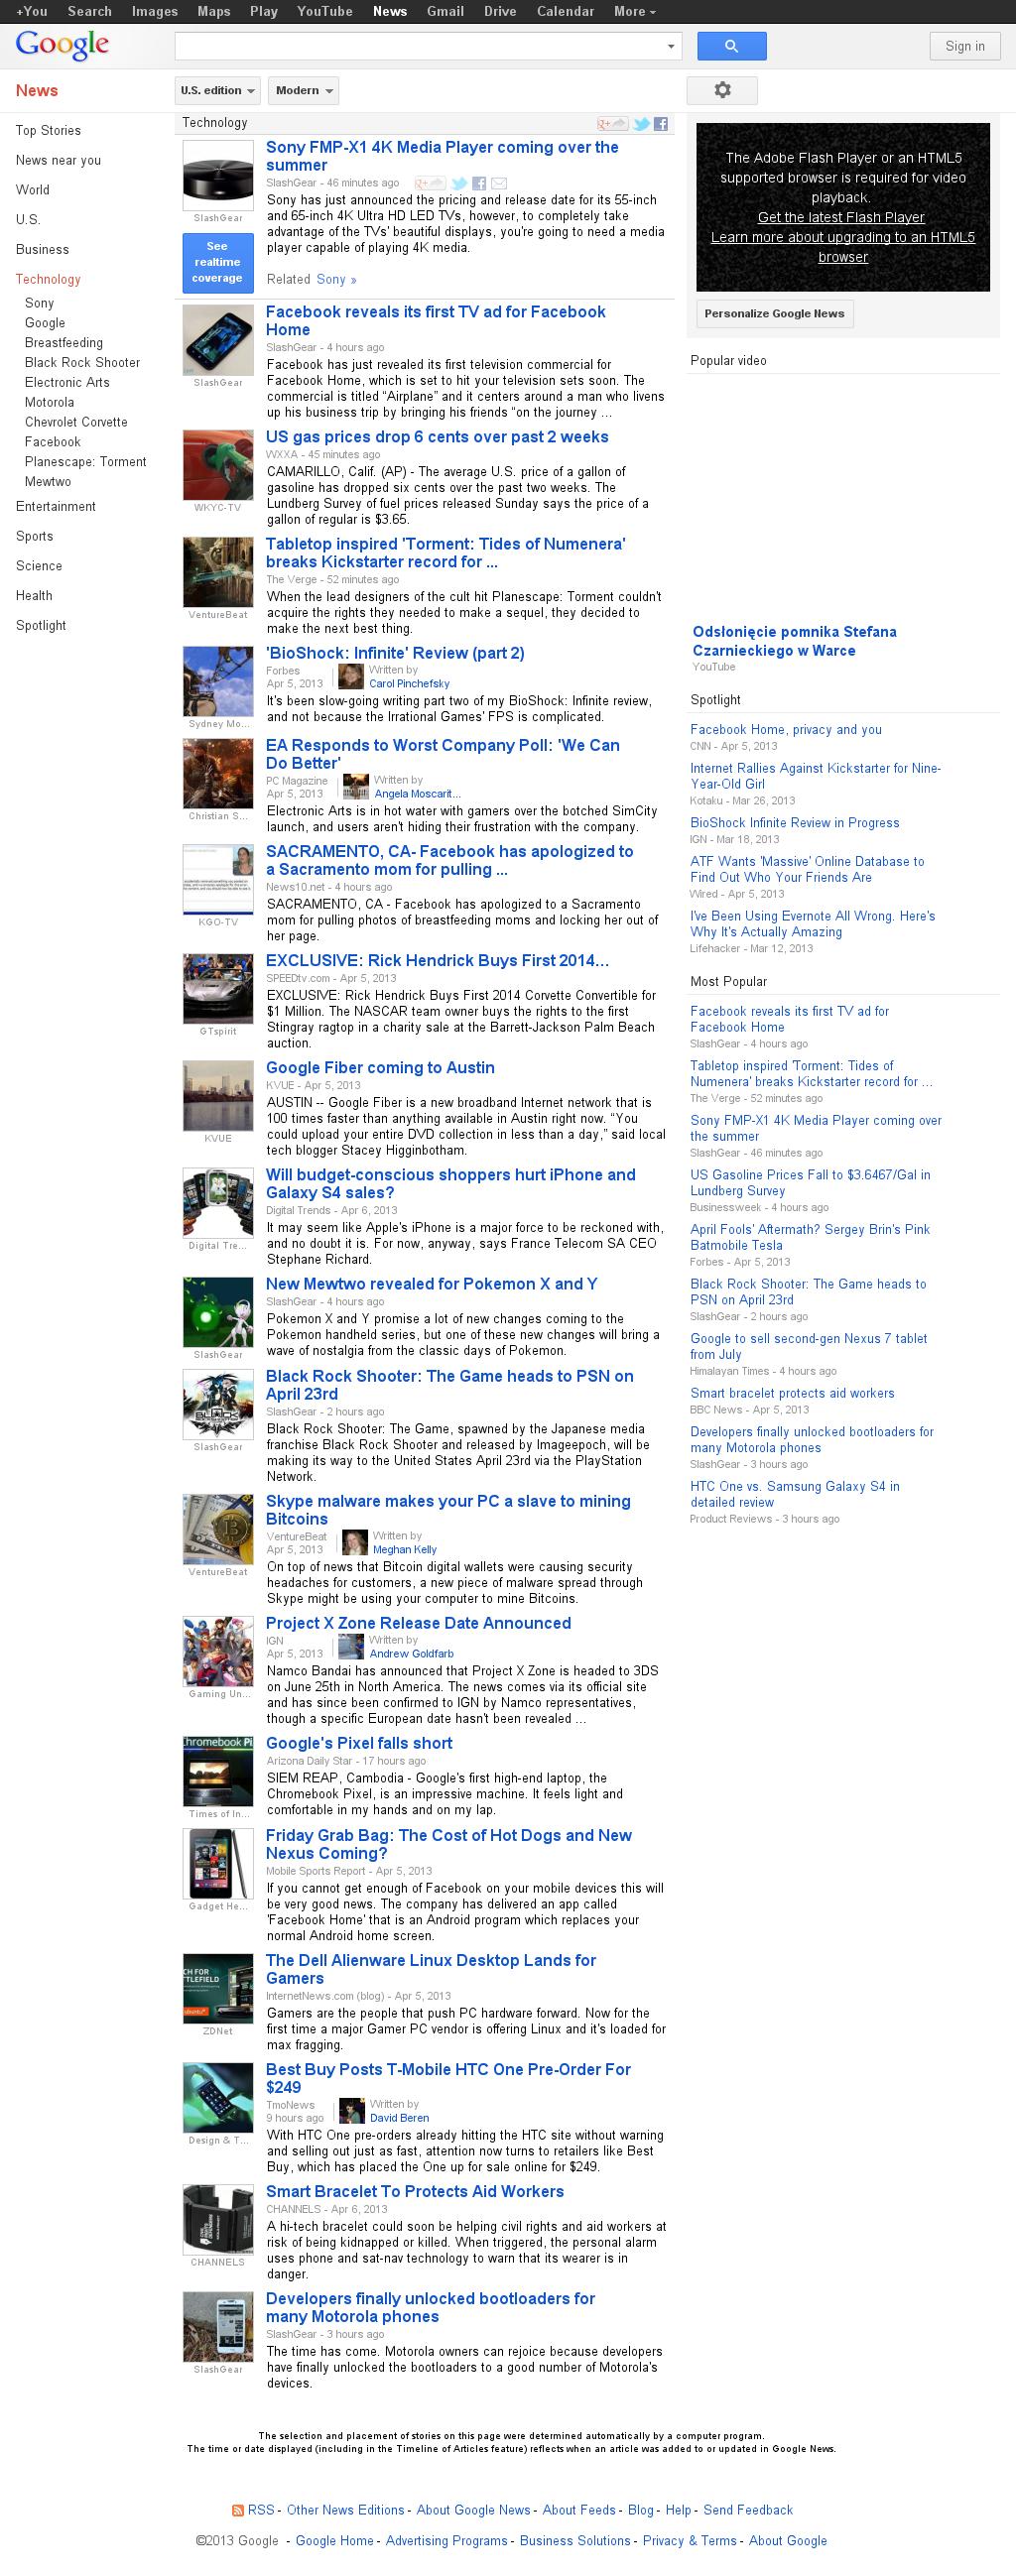 Google News: Technology at Monday April 8, 2013, 12:08 a.m. UTC